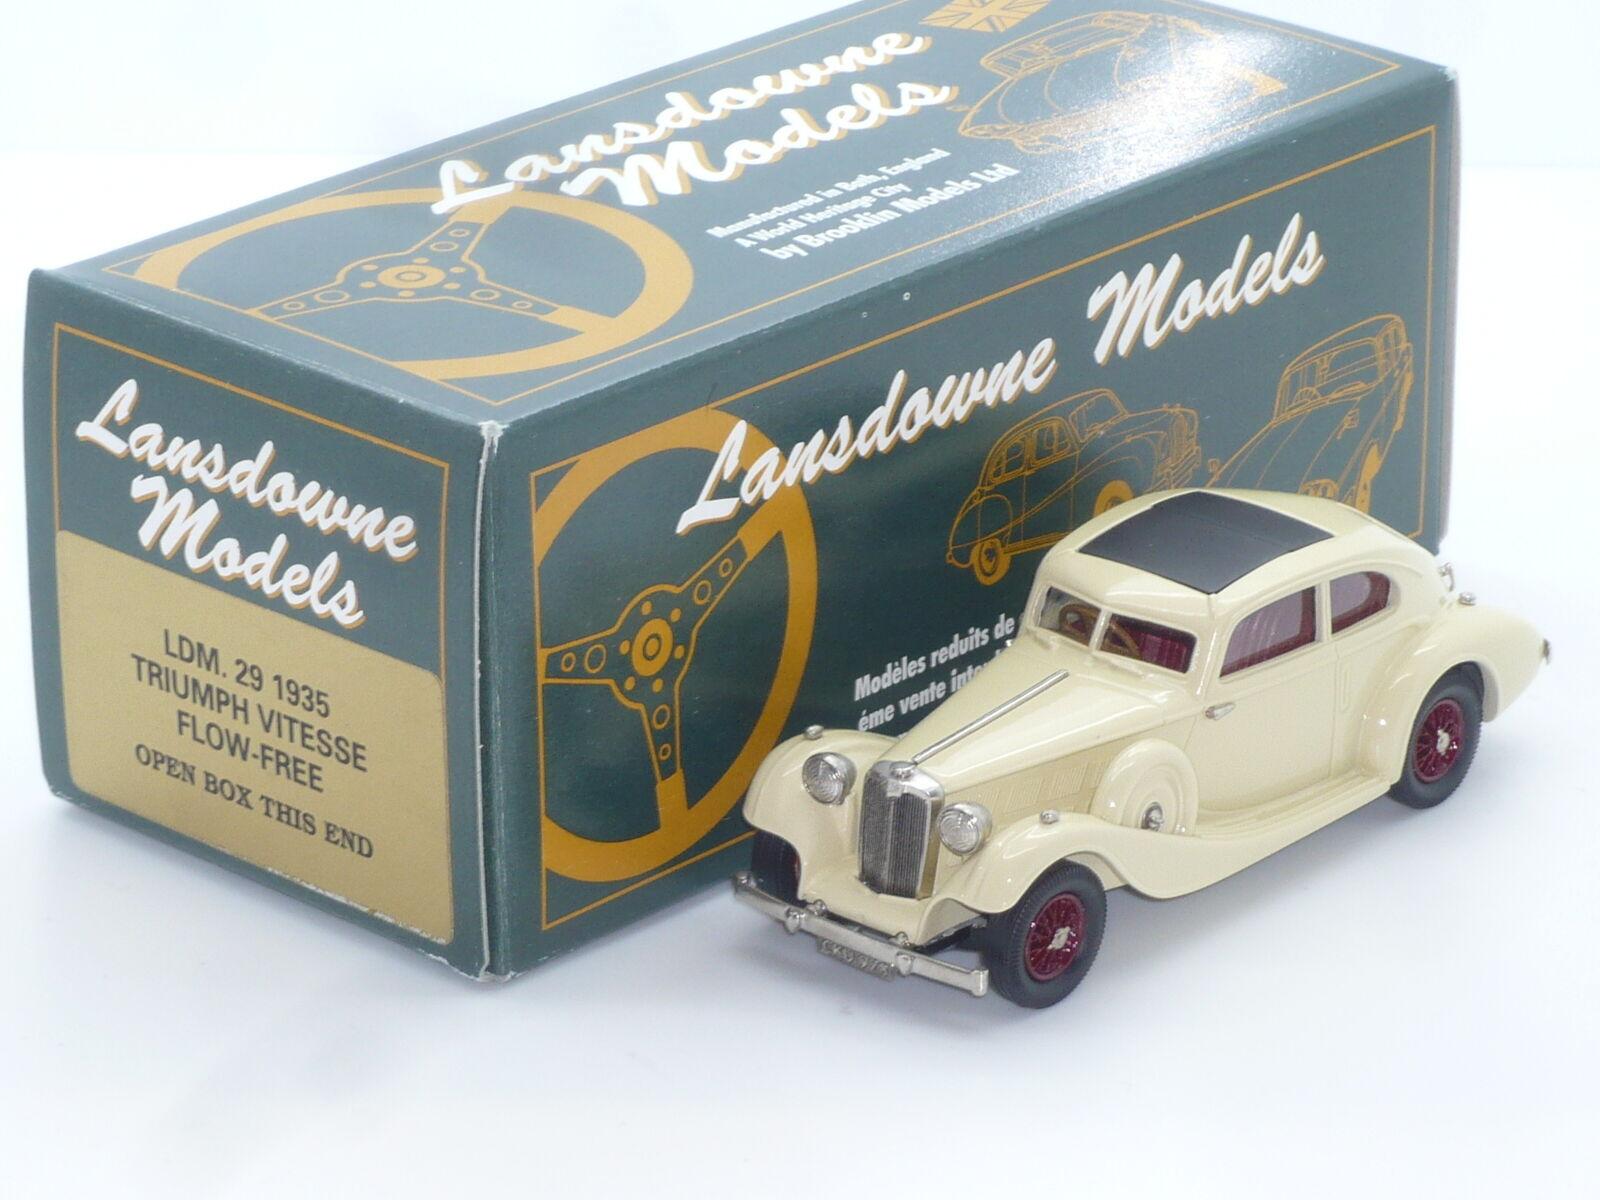 Neue 1 43 lansdowne modelle ldm29 1935 triumph handbuilt brooklin flowfree vitesse